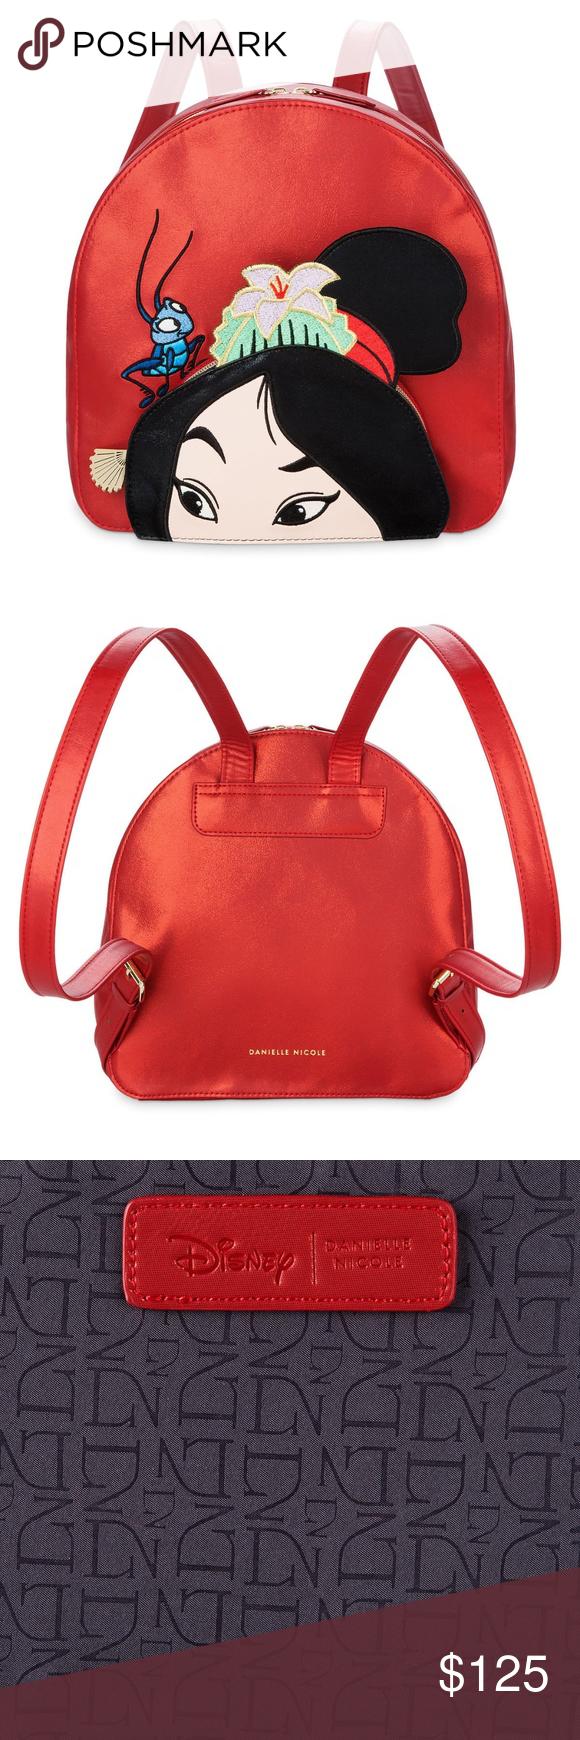 193bf555d71 Disney  amp  Danielle Nicole Mulan Mini Backpack NWT Disney  amp  Danielle  Nicole Mulan Mini